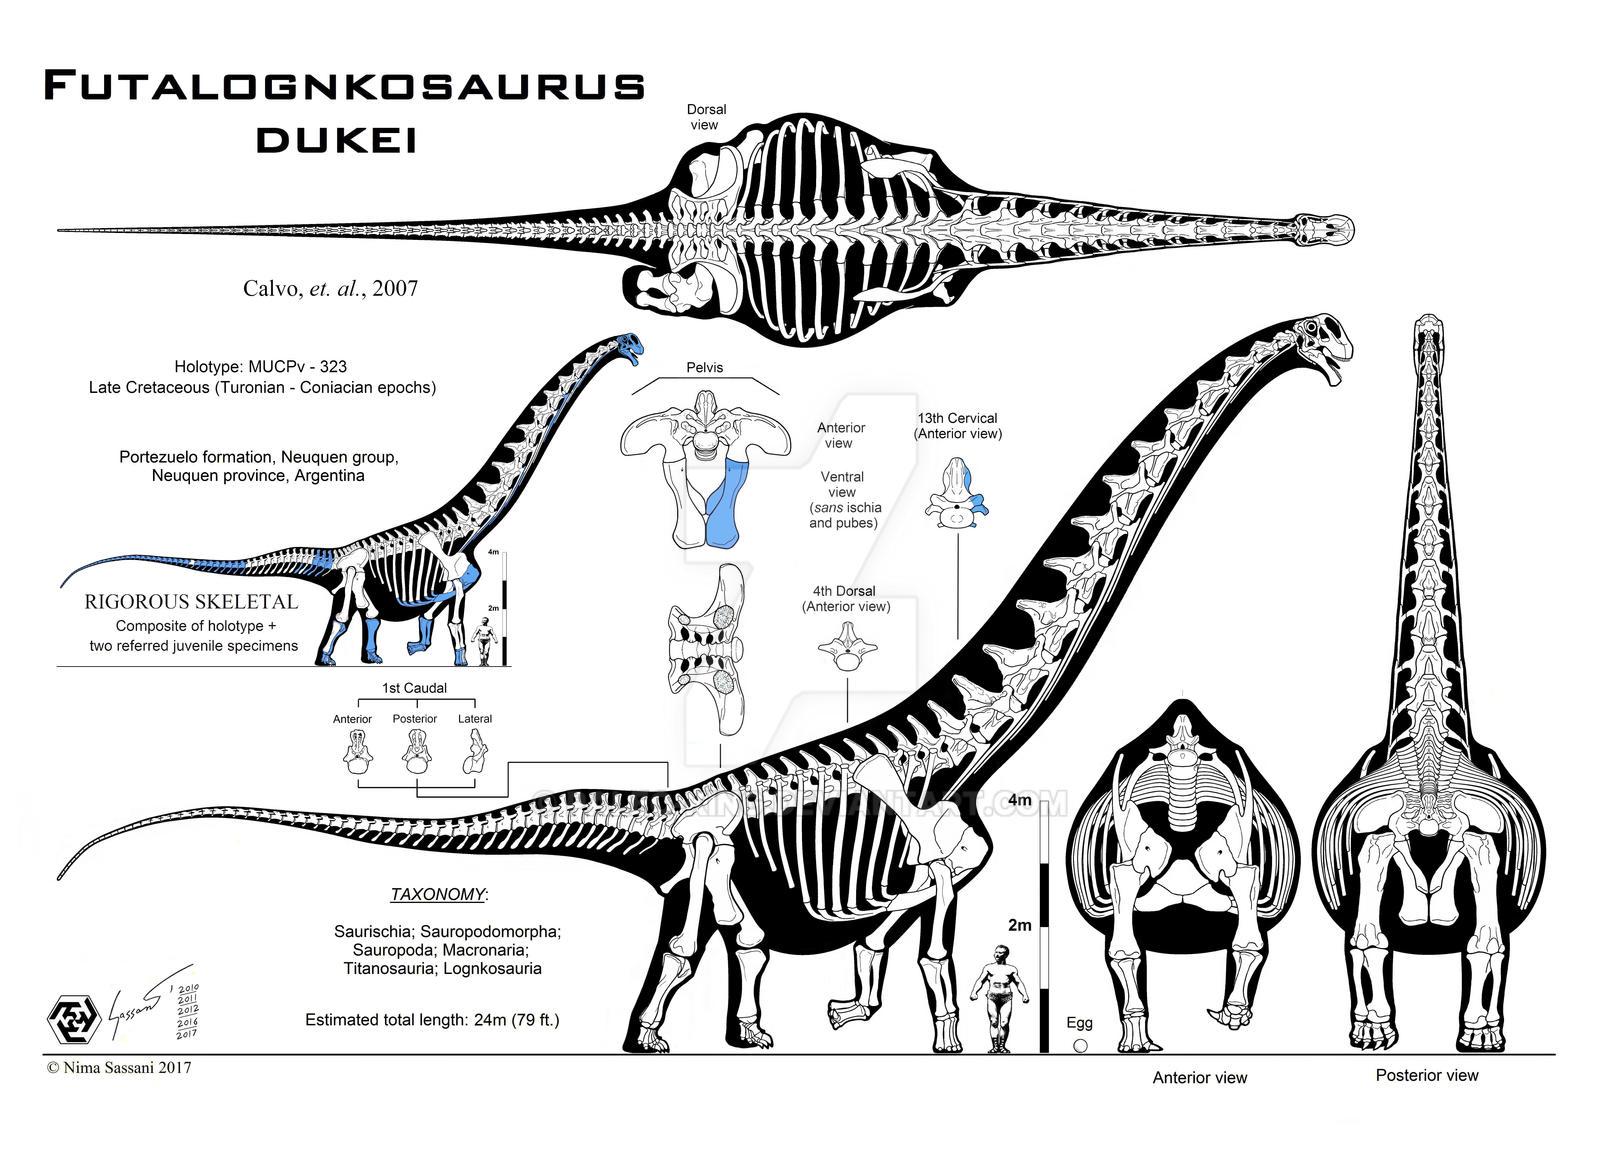 Futalognkosaurus dukei Mk. X (Calvo edition) by Paleo-King